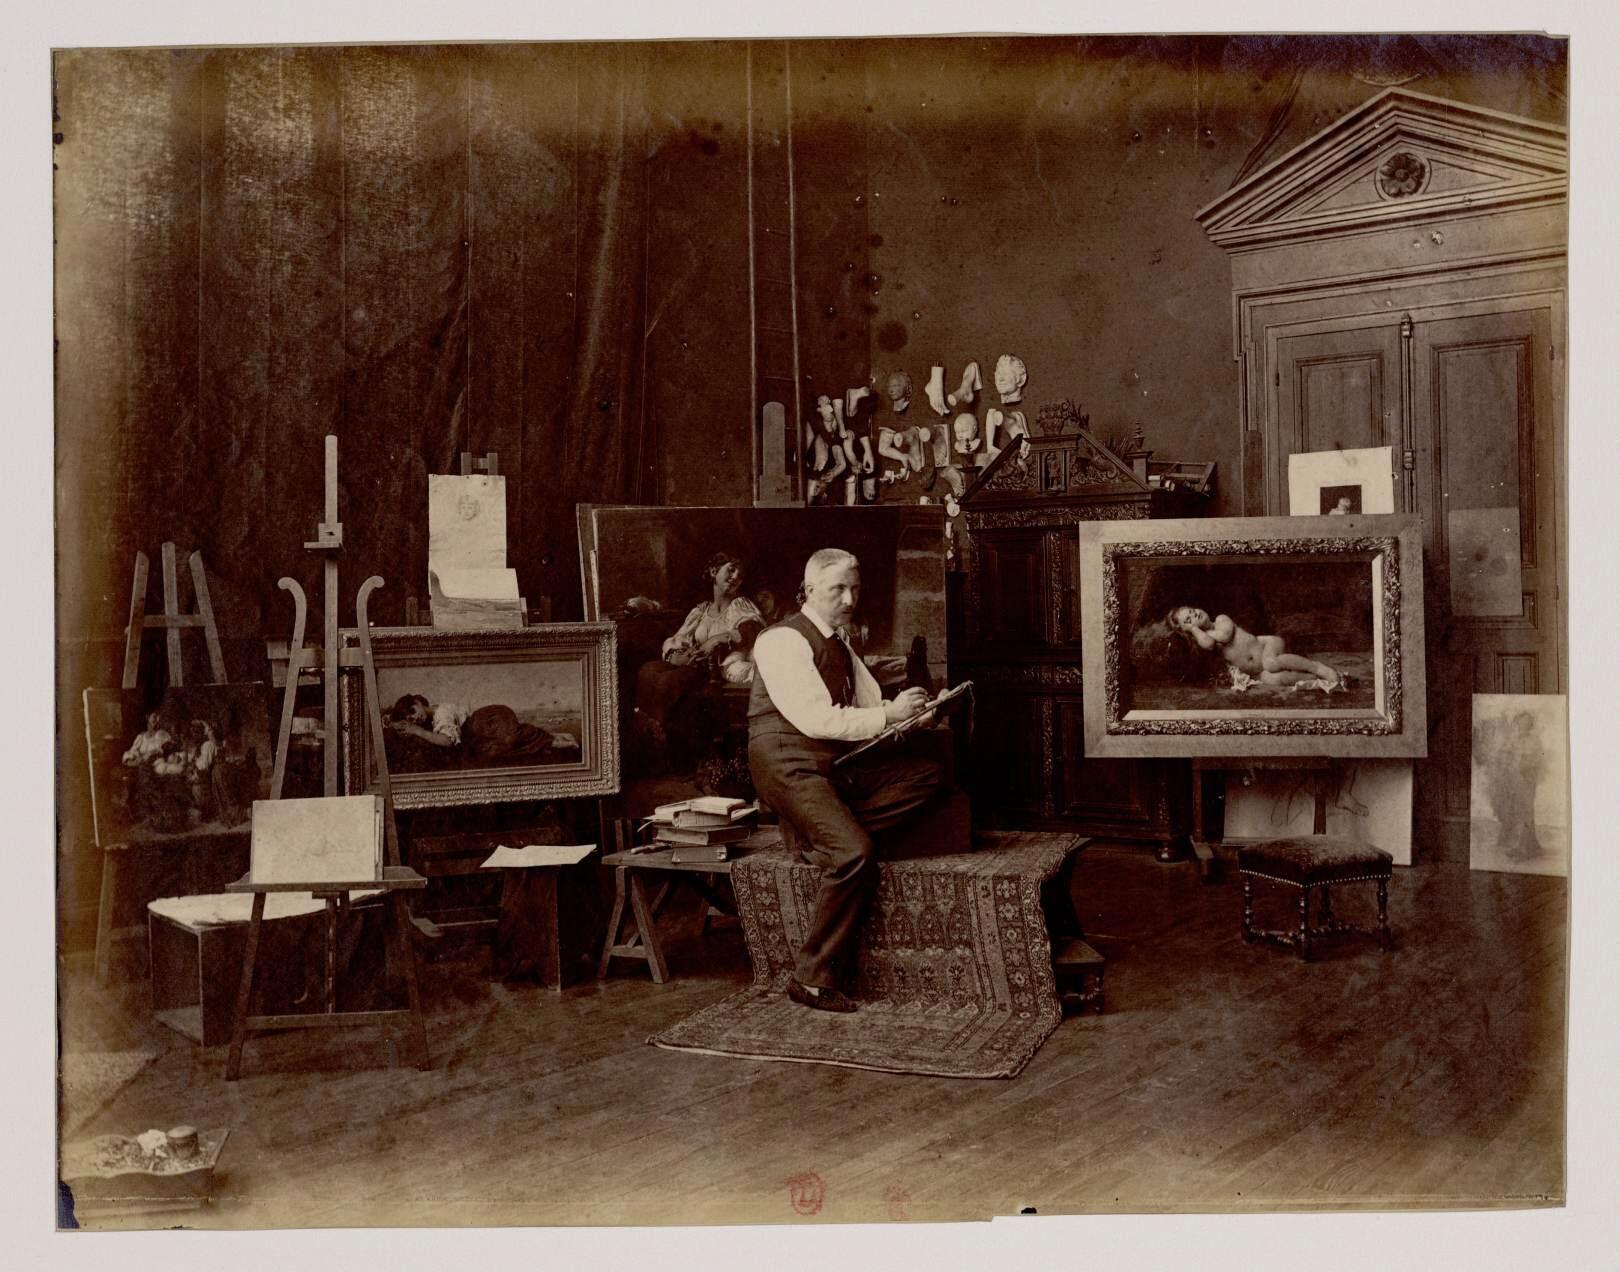 Леон Базиль Перро (1832-1908) - французский живописец академического стиля